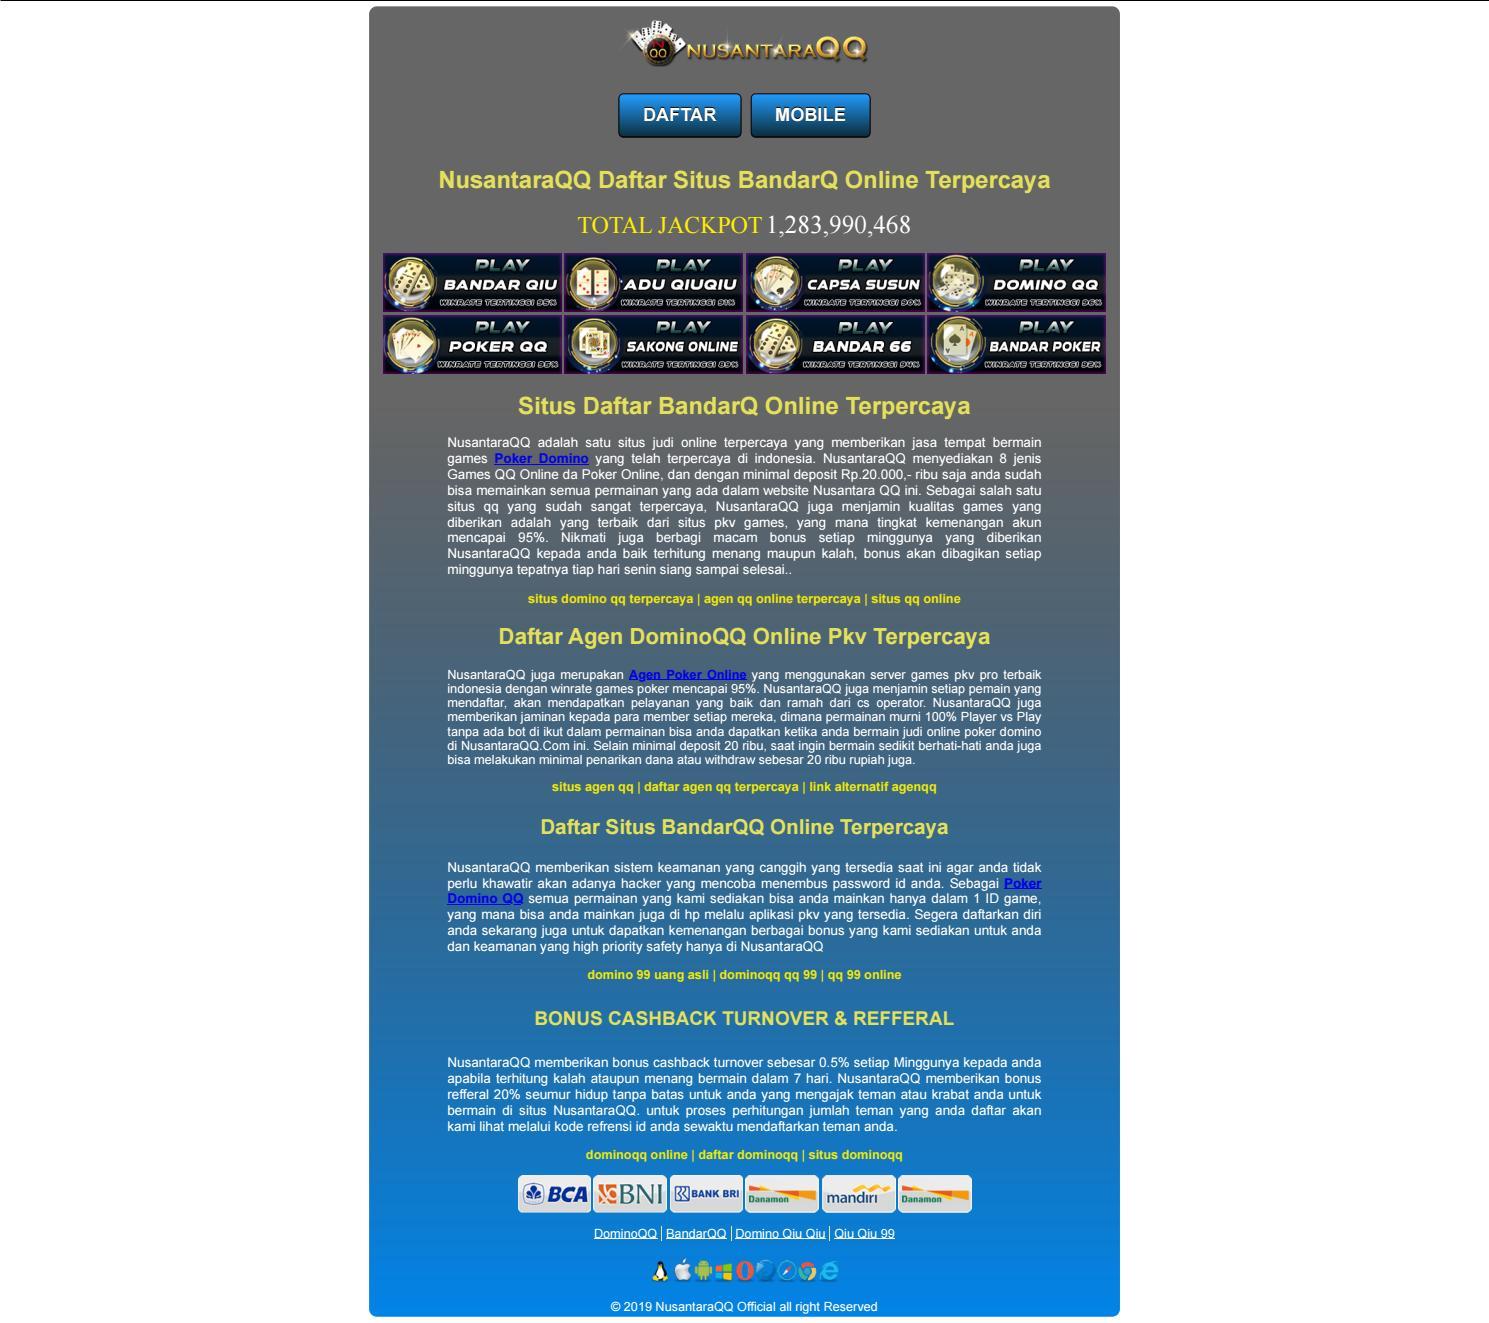 Nusantaraqq Daftar Situs Bandarq Online Terpercaya By Belajar Giat Issuu